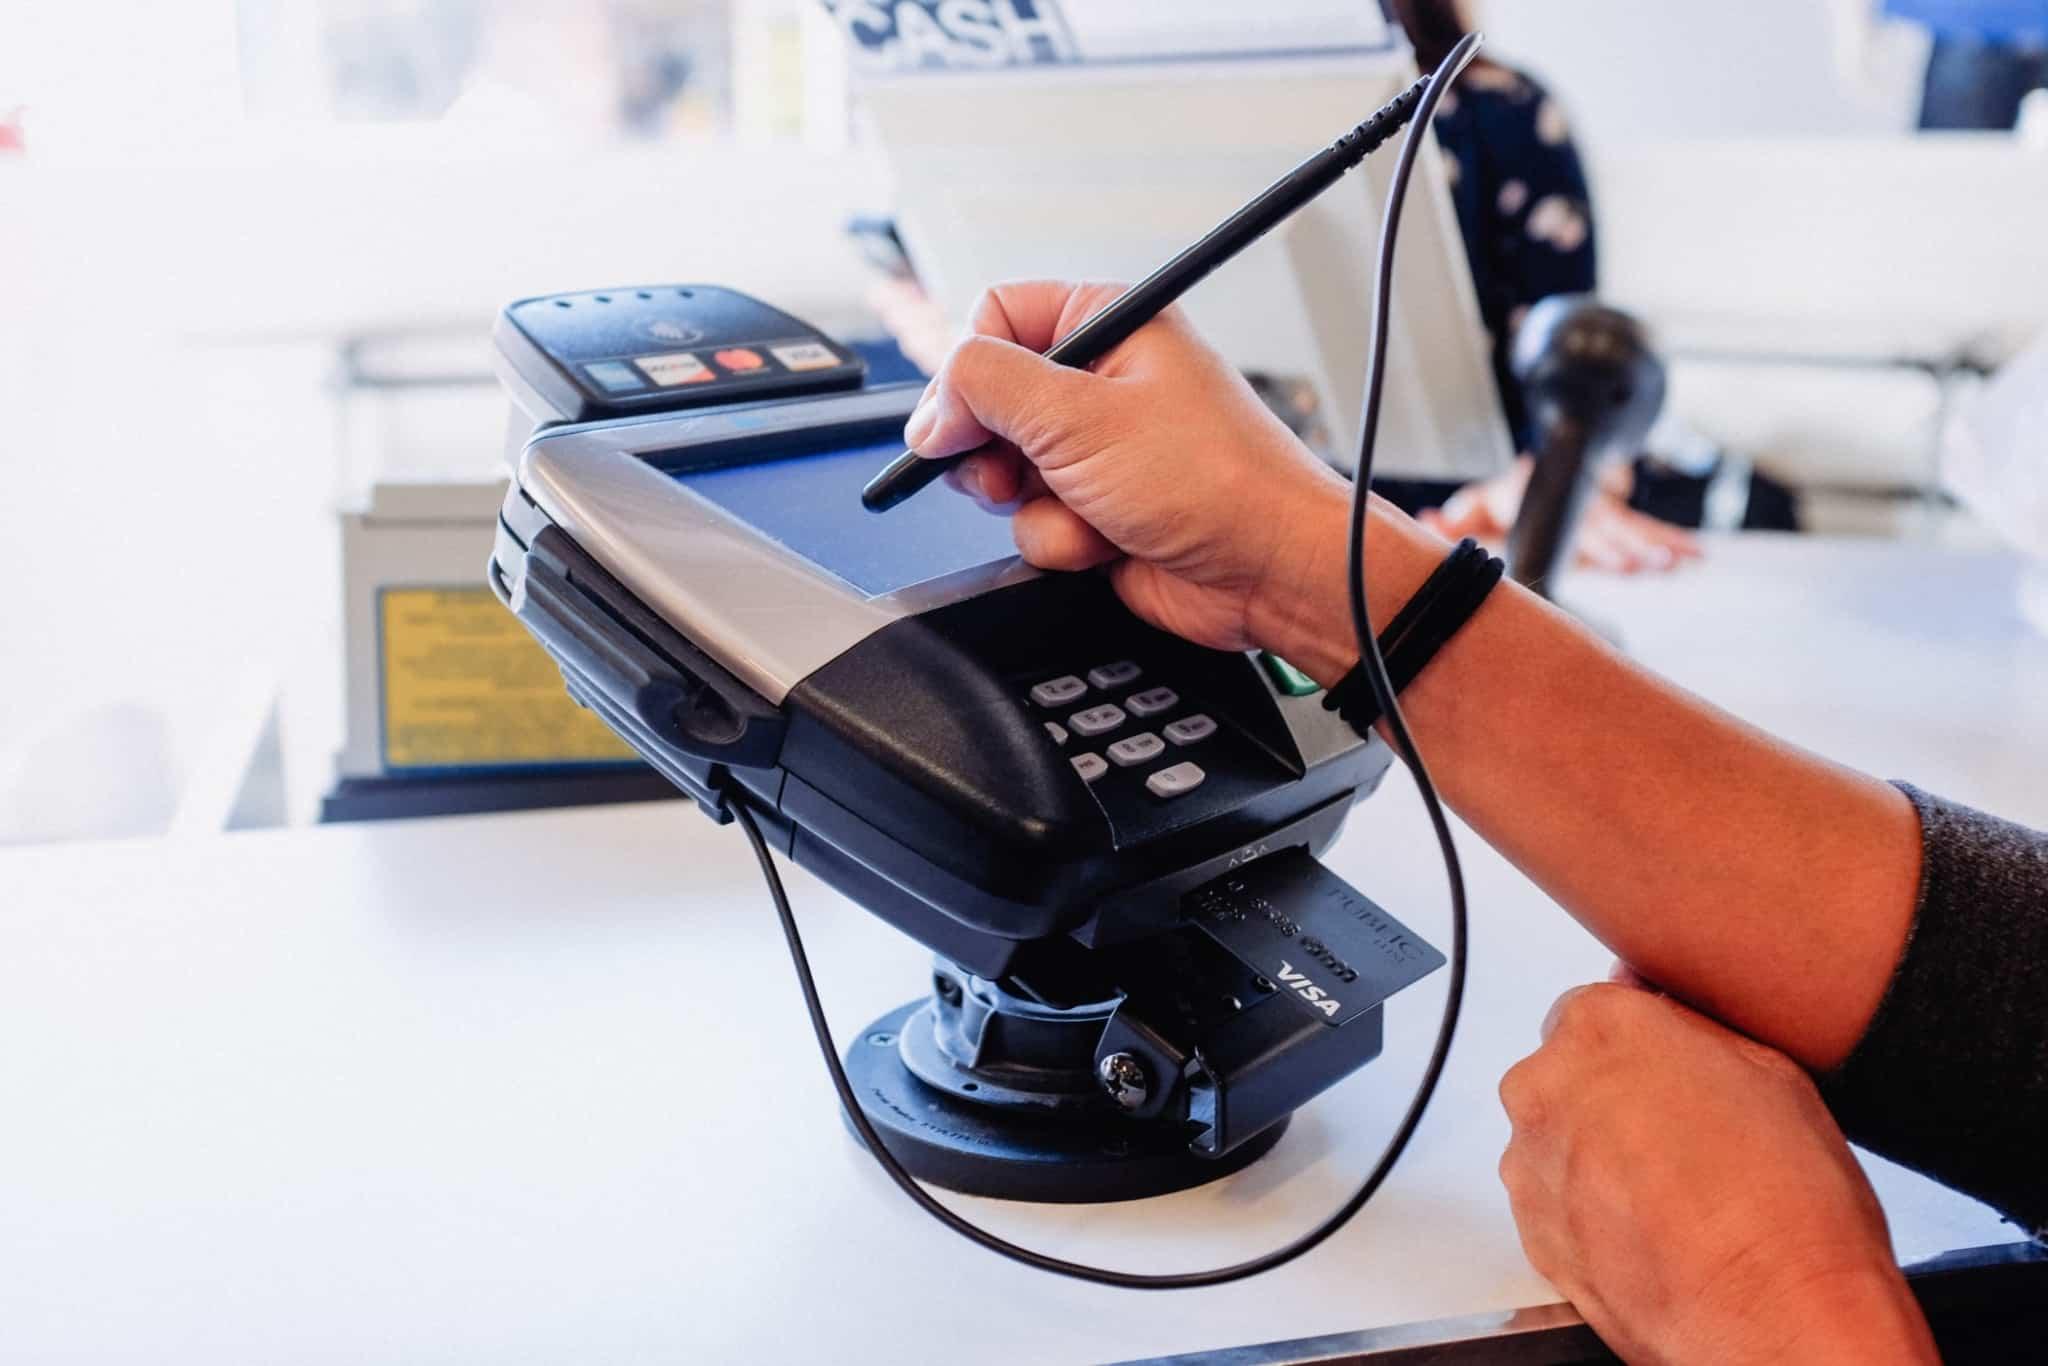 cliente a assinar num posto de pagamento de multibanco